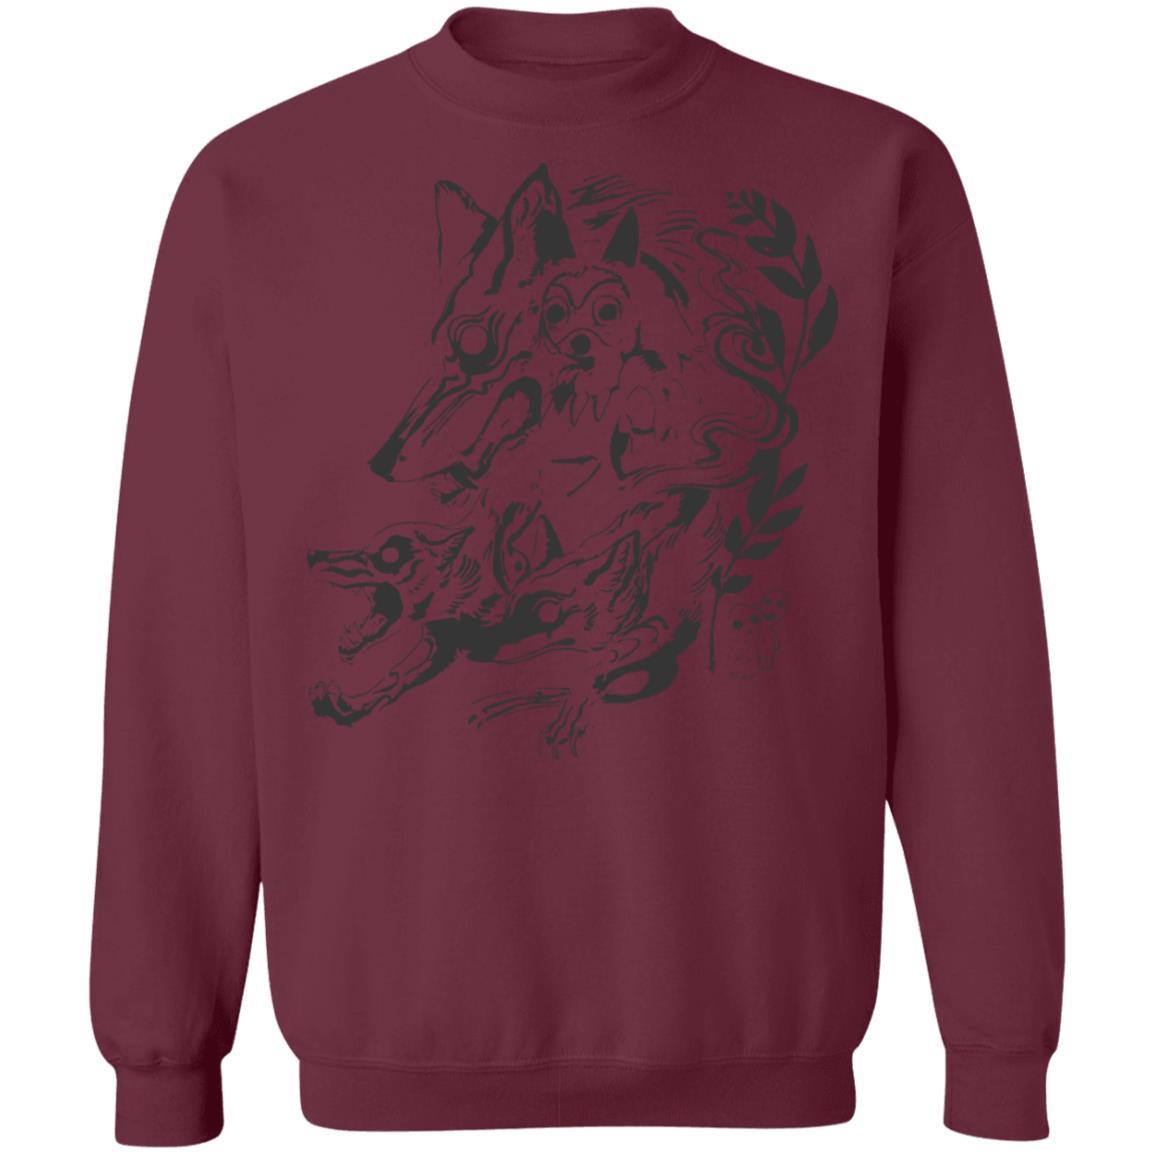 Princess Mononoke and The Wolf Creative Art Sweatshirt Unisex